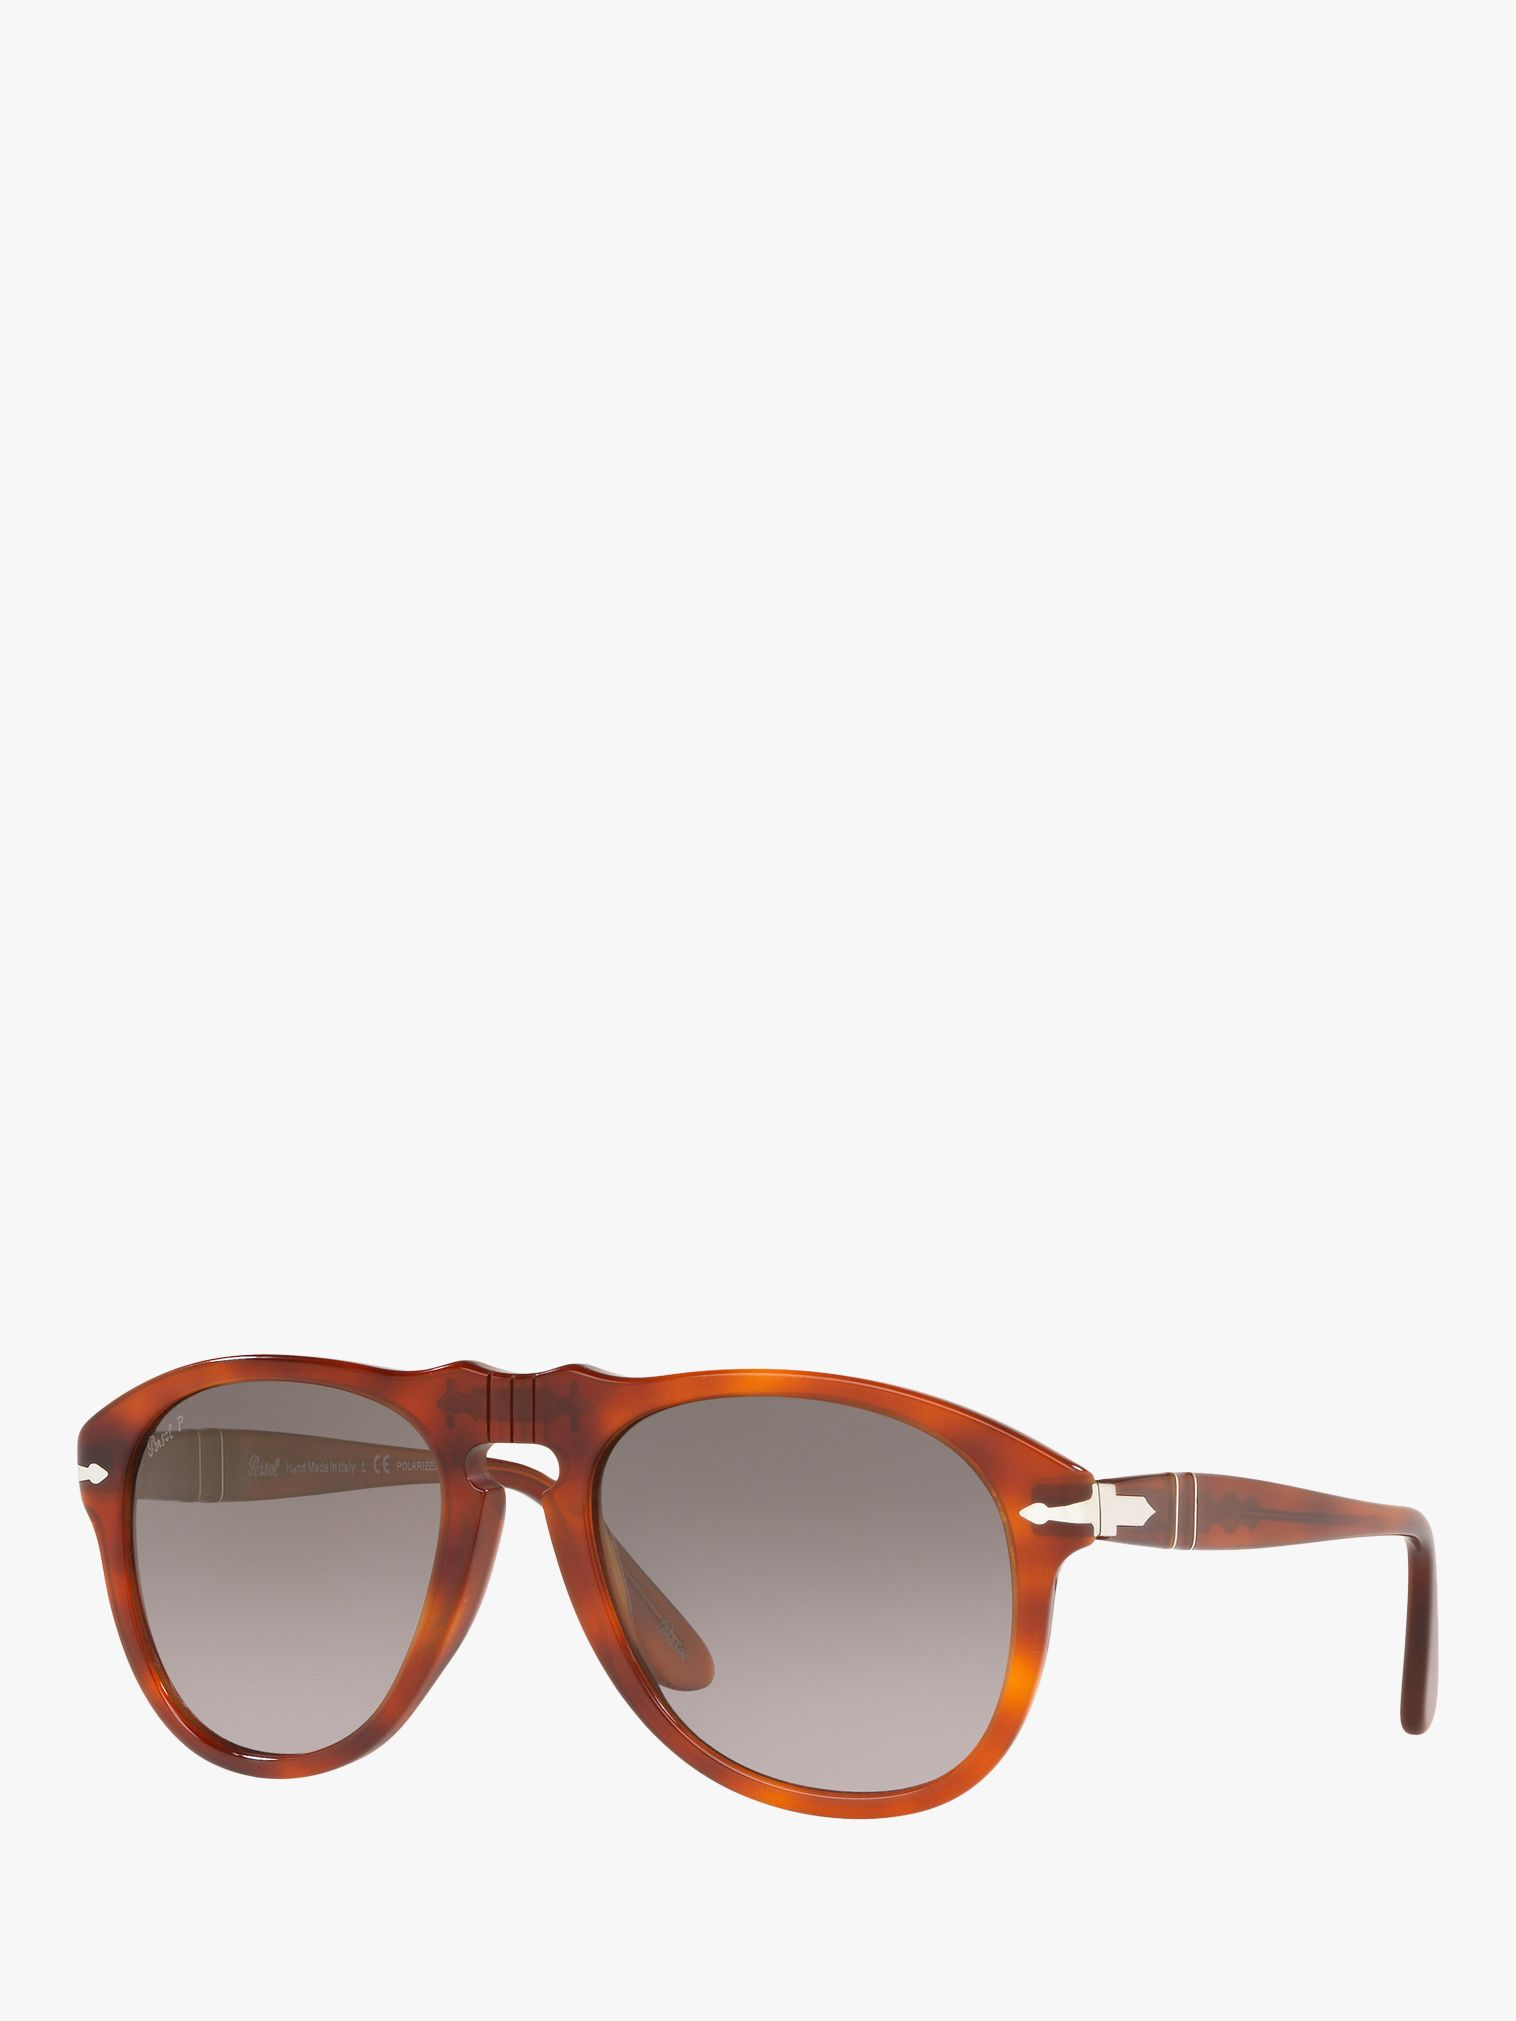 Persol Persol PO6049 Polarised Pilot Sunglasses